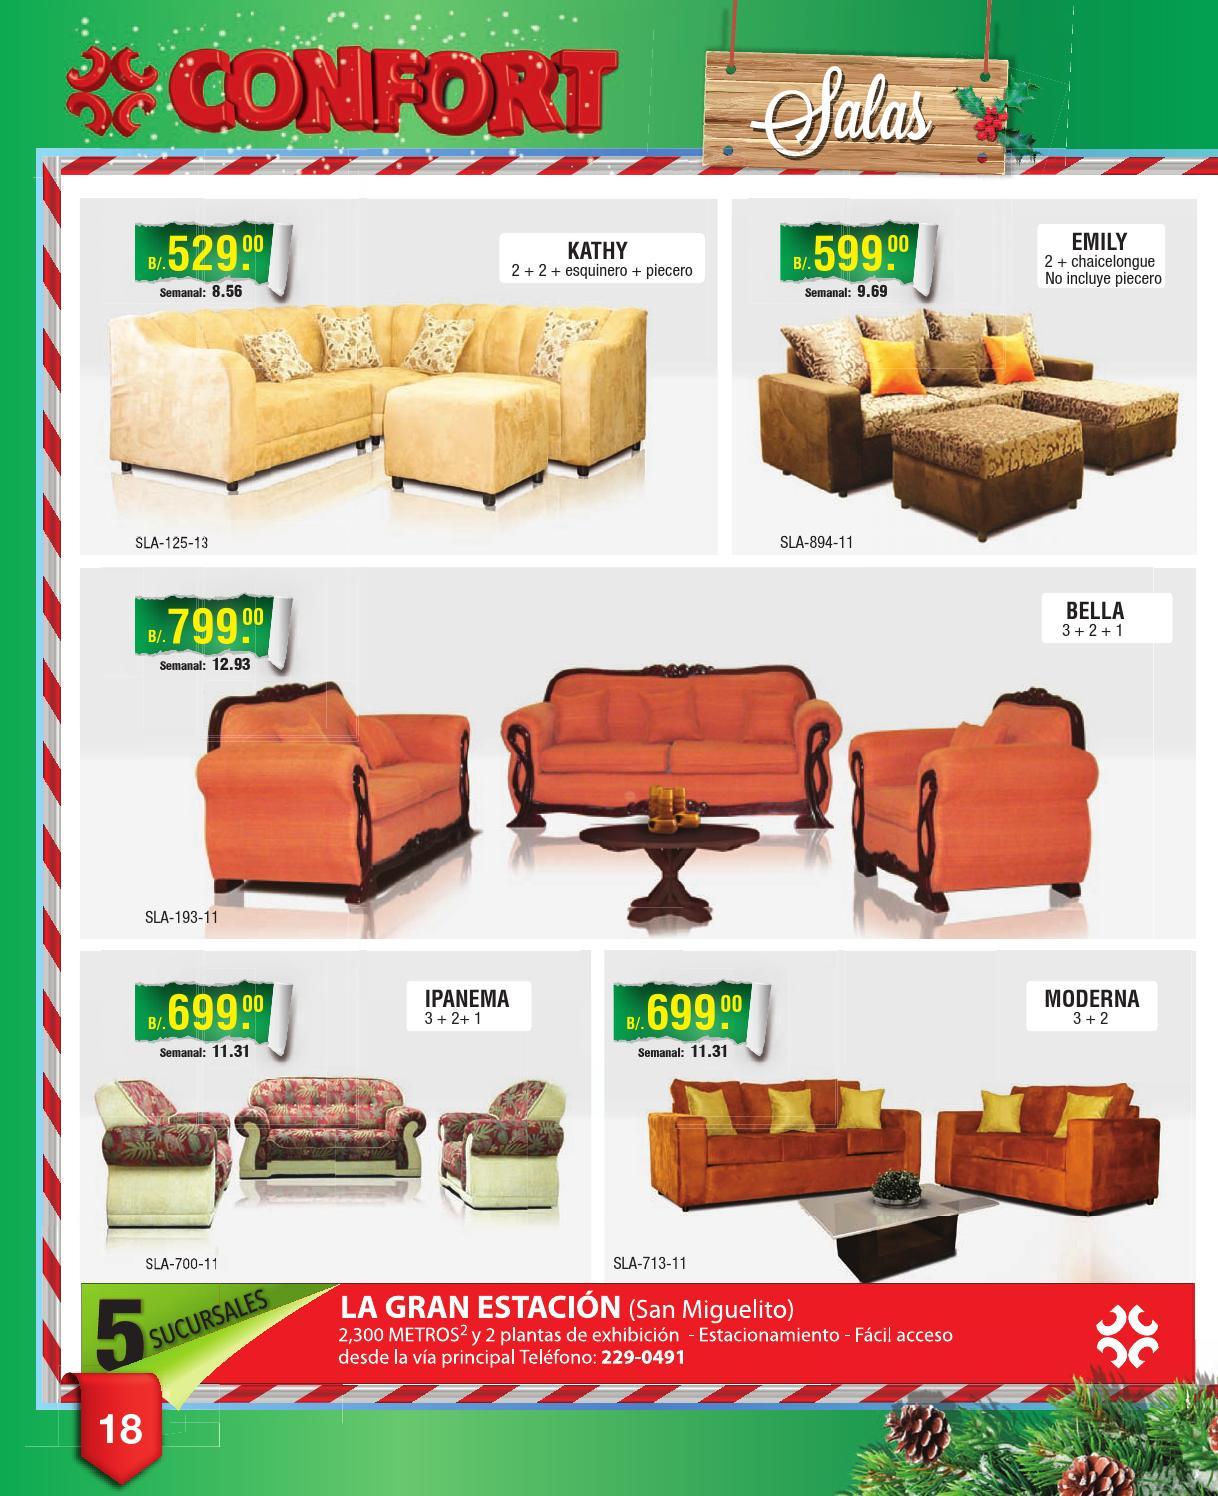 Casa confort panam by interiores estilo issuu - Mundo joven muebles catalogo ...